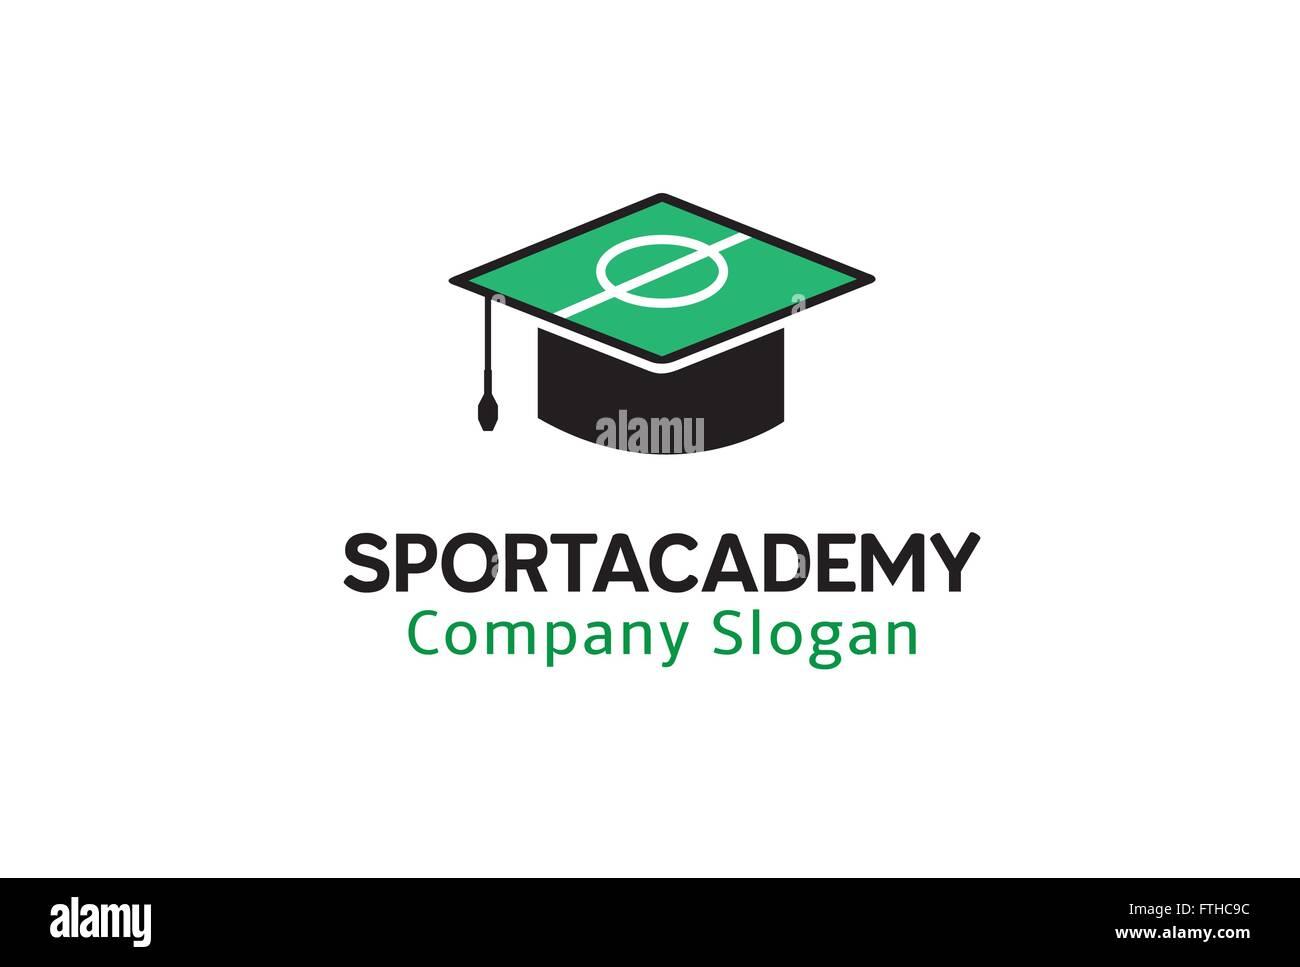 Sport Academy Design Illustration - Stock Vector